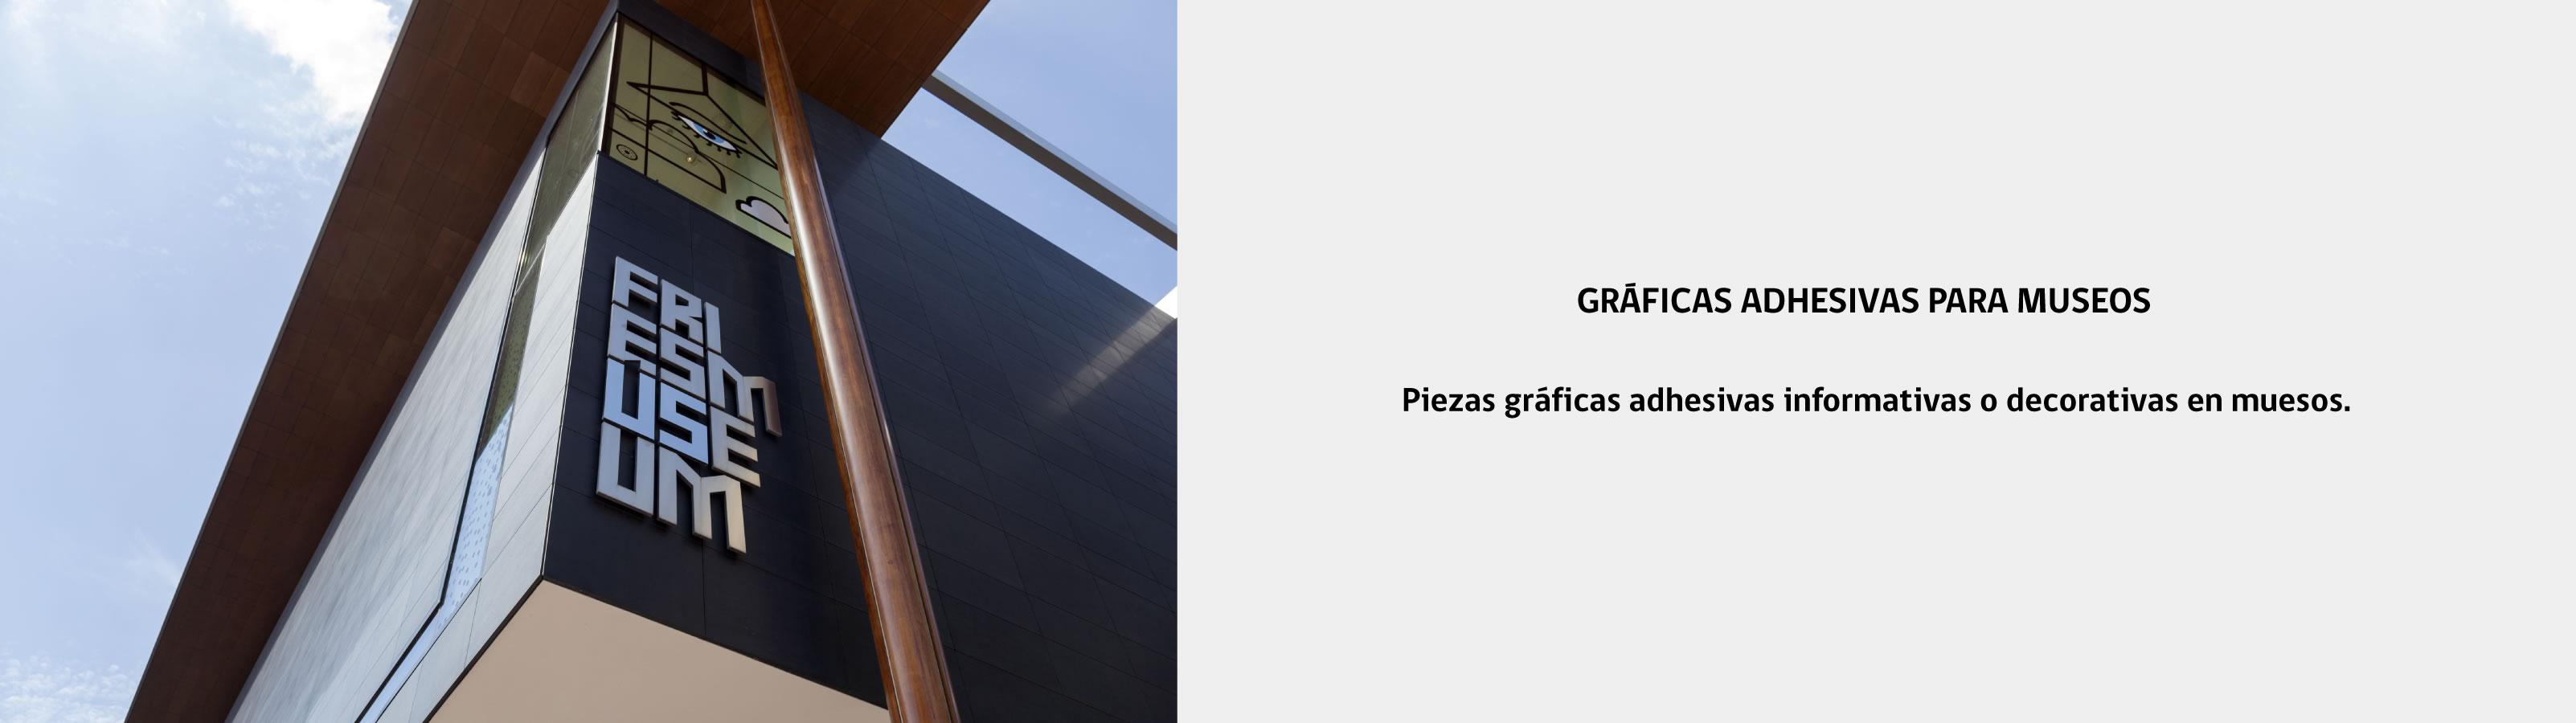 Grafica-Adhesiva-para-Museos